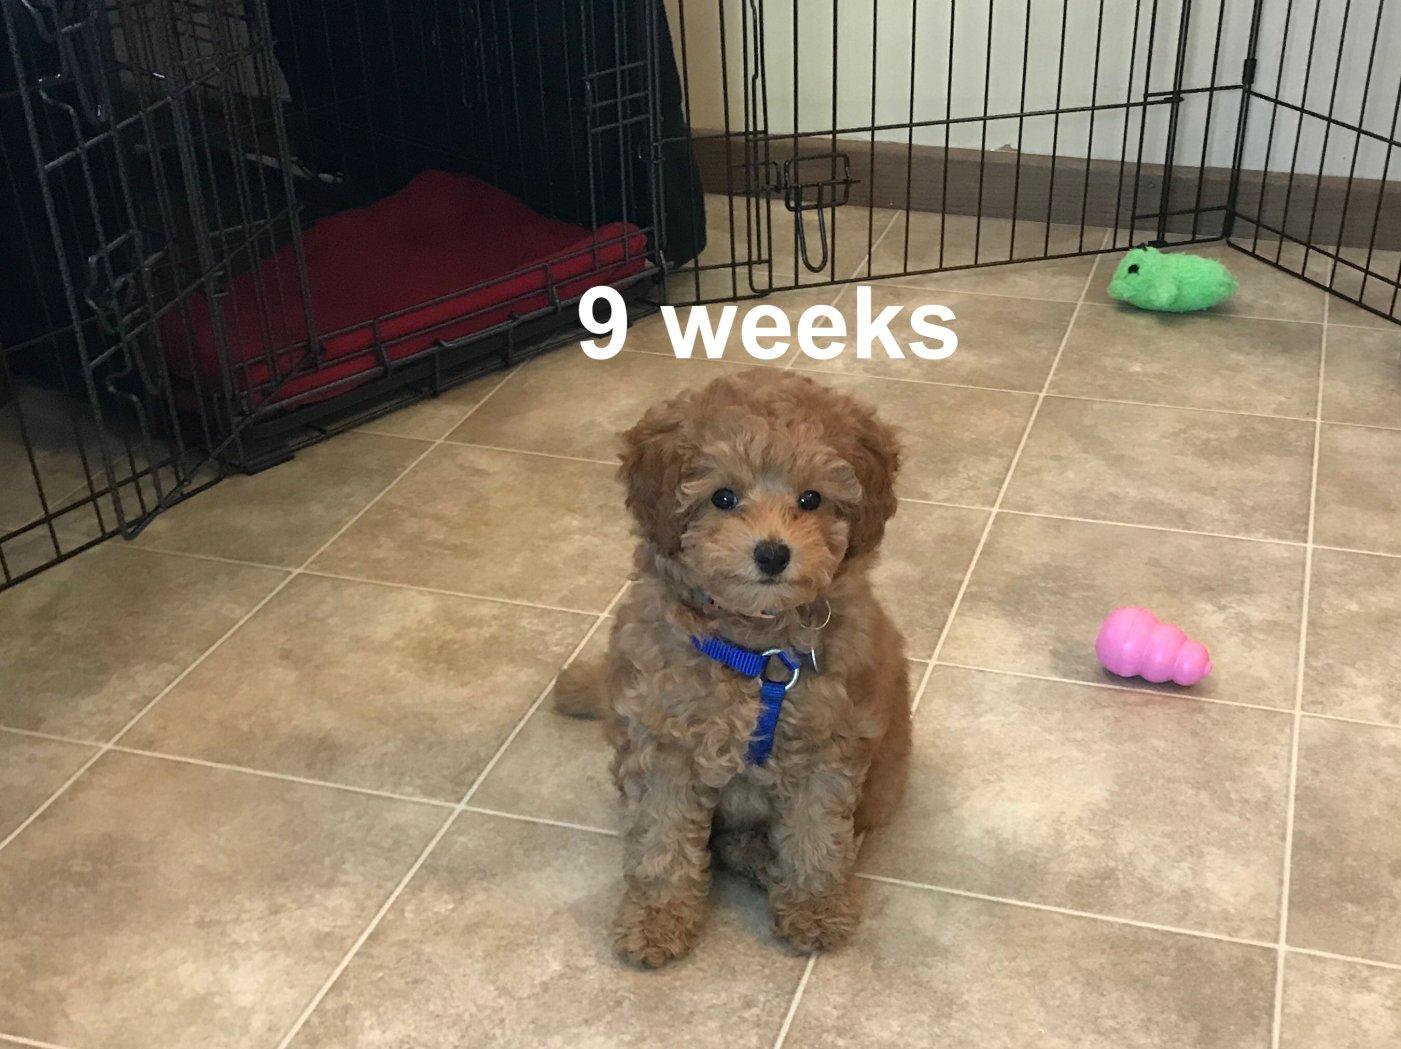 52 weeks of Lacey Rose-341ca1a3-779c-4da7-8aa7-e65e0e409516.jpg